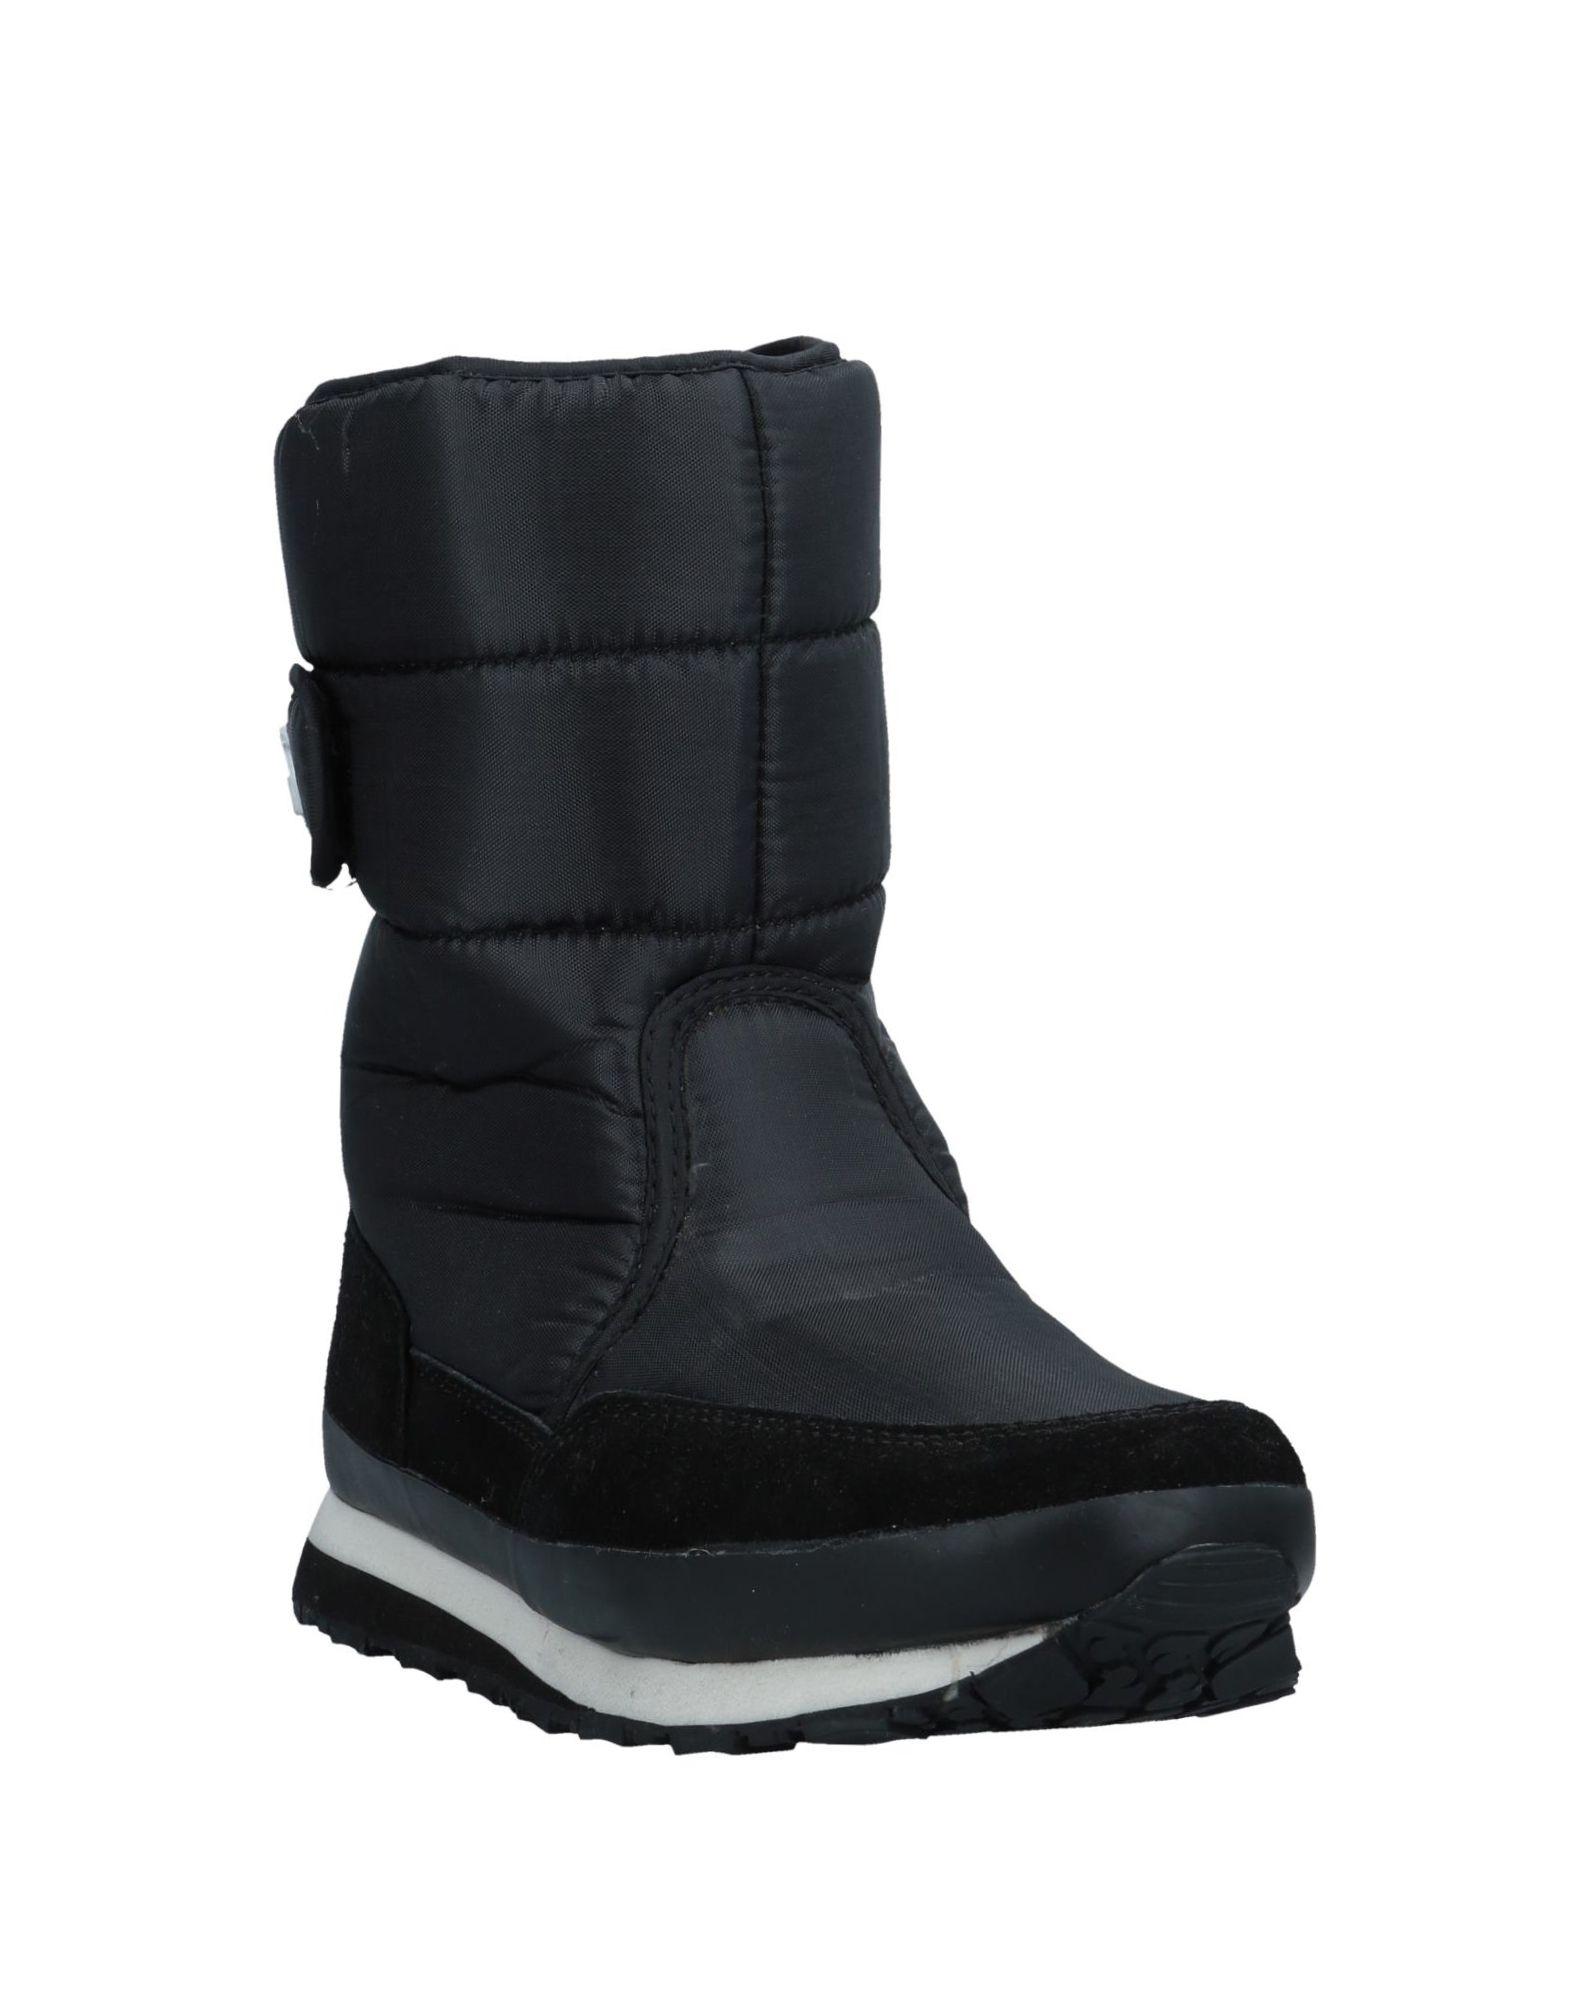 Rubber Duck Stiefelette Damen beliebte  11547019KX Gute Qualität beliebte Damen Schuhe 6d3520